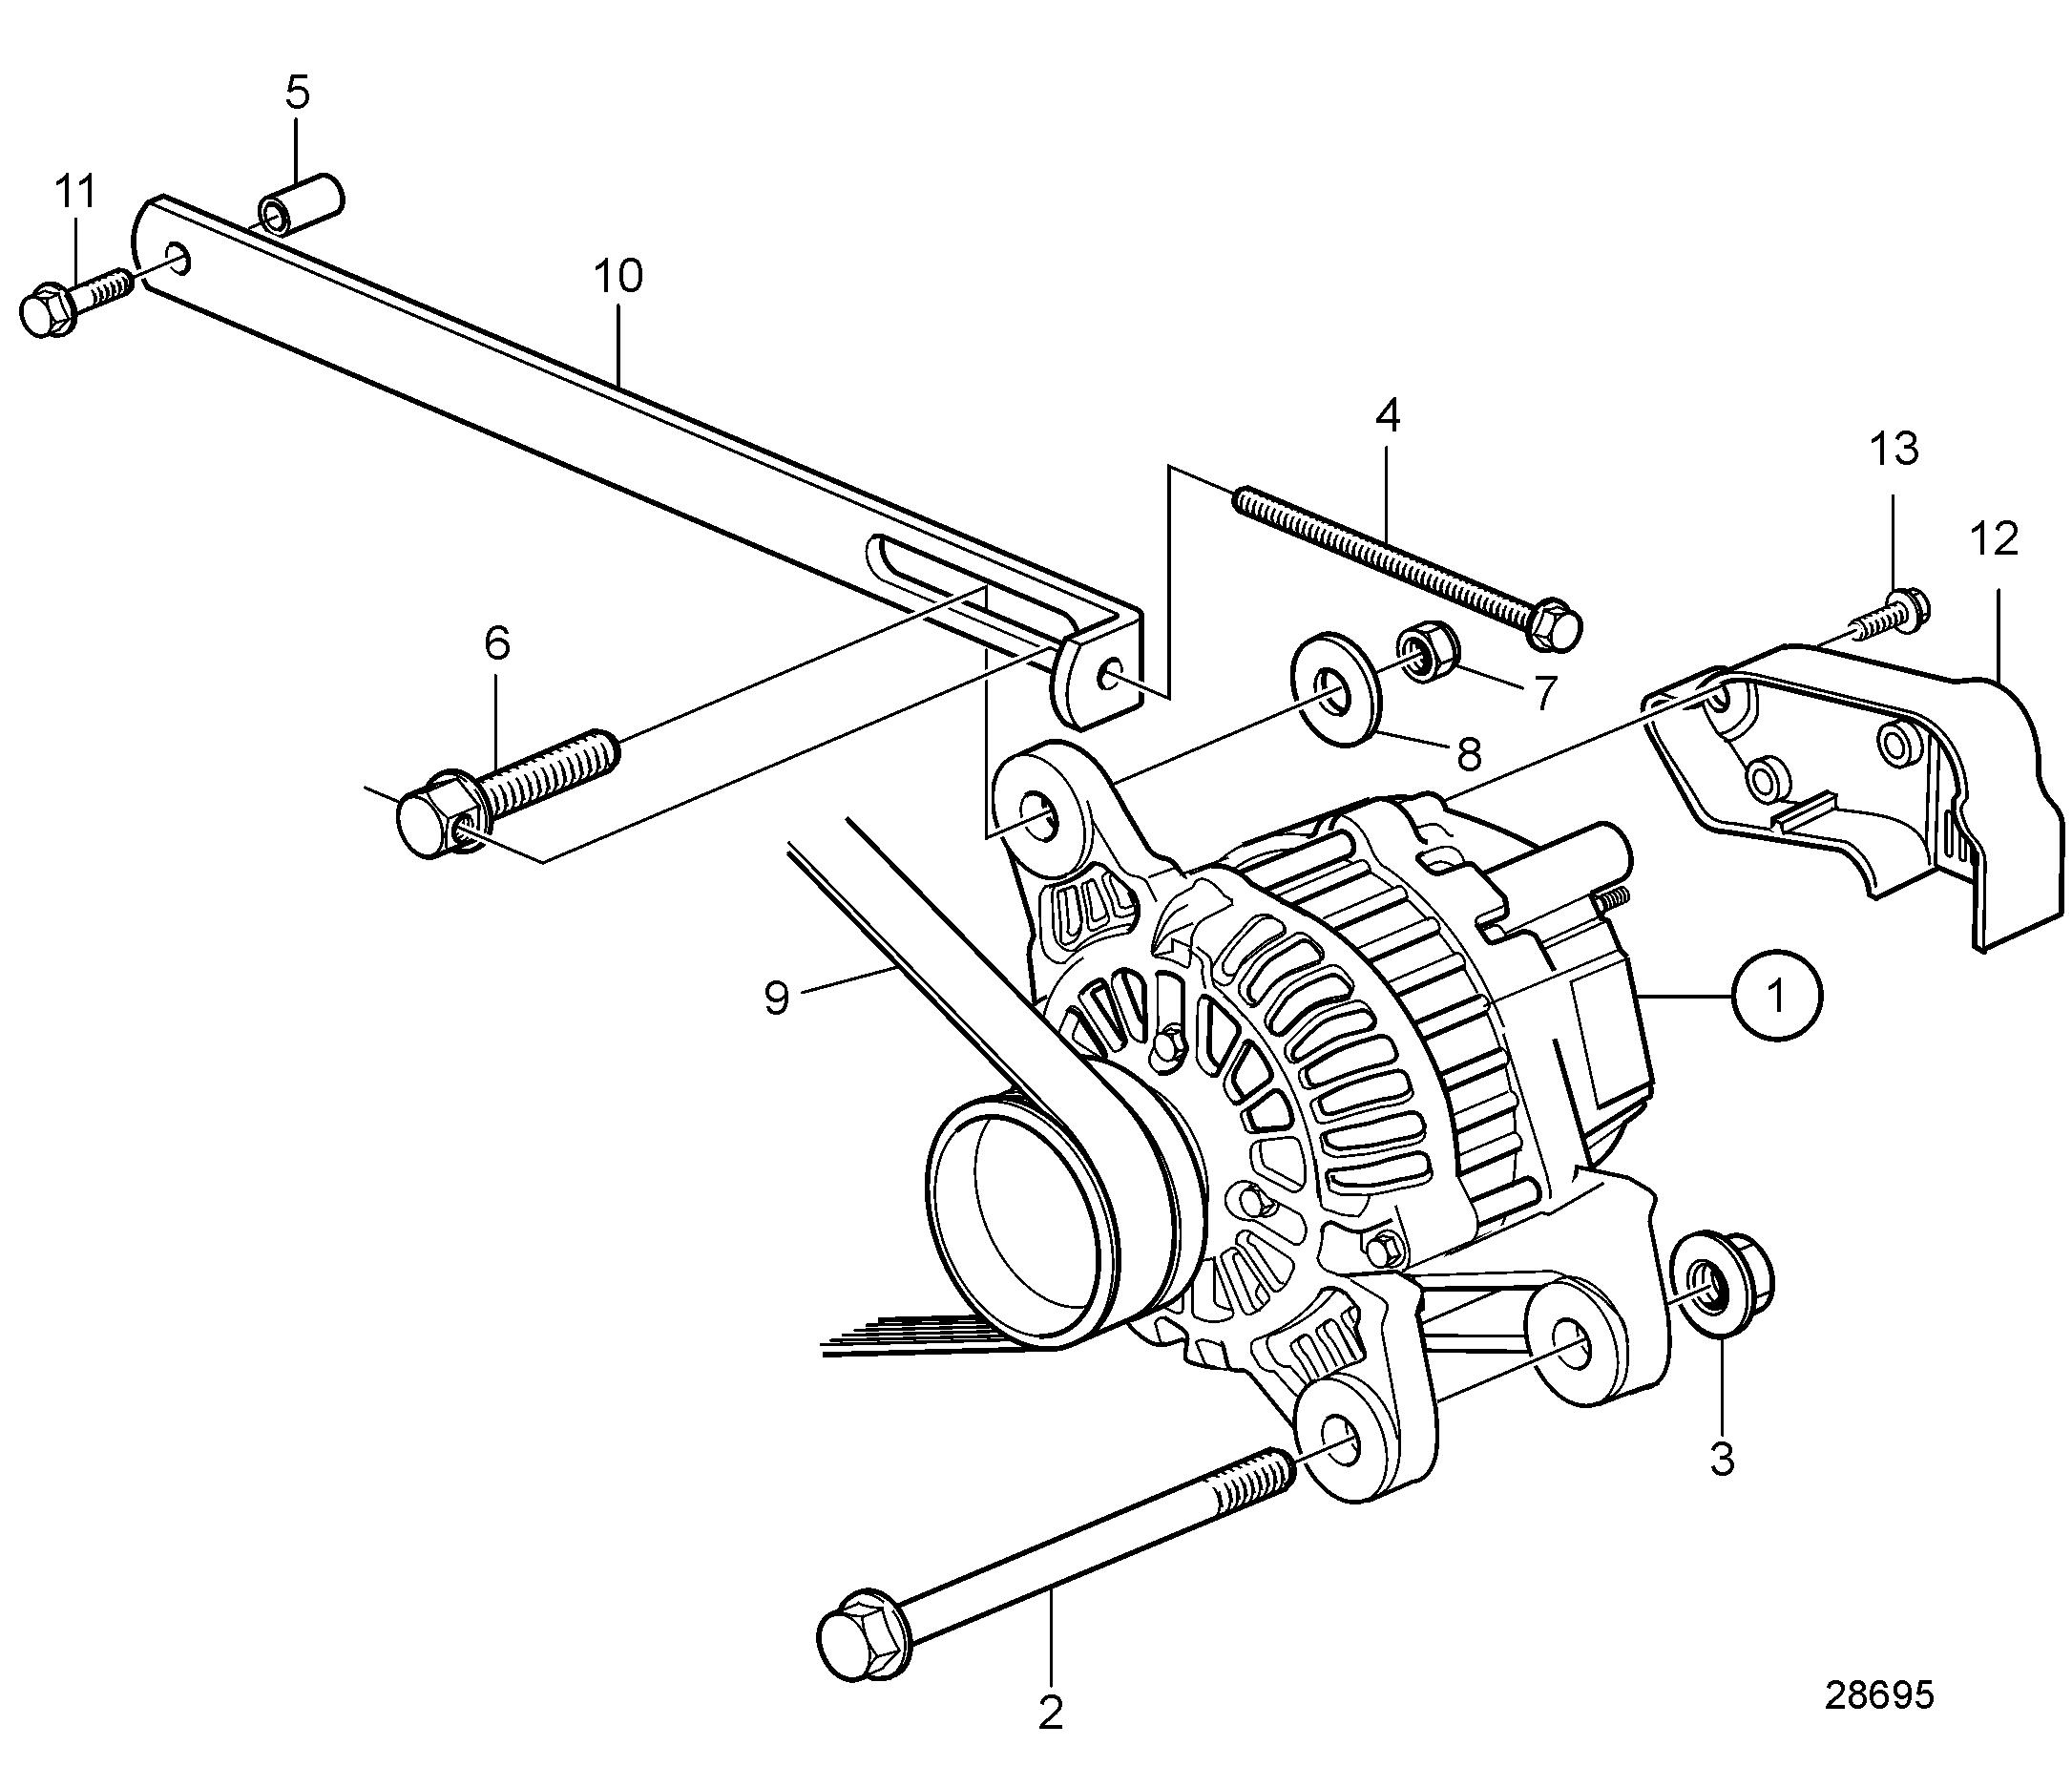 sprinter rv wiring diagram